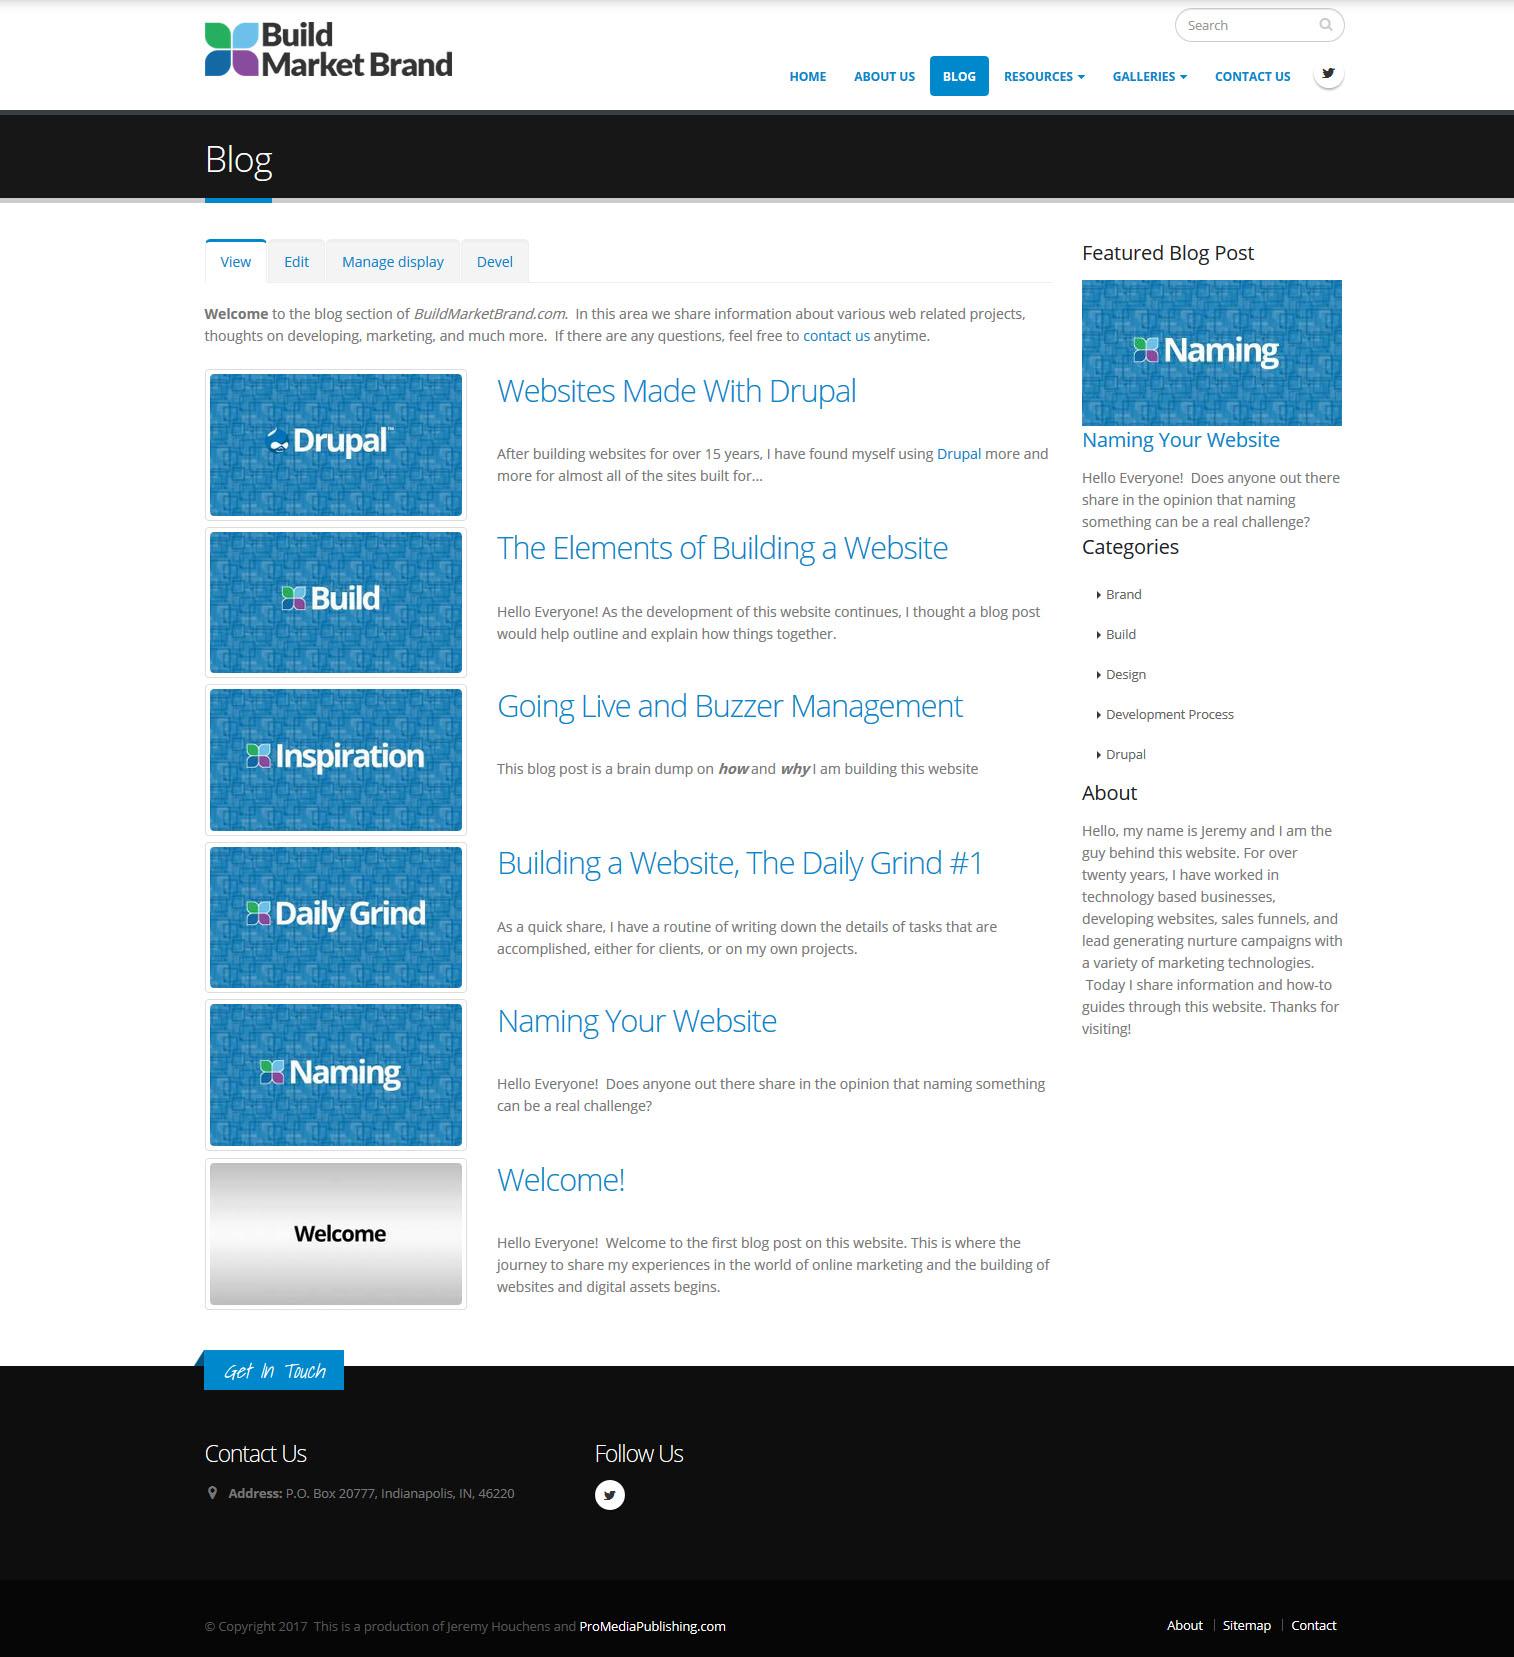 Building a Website - Blog